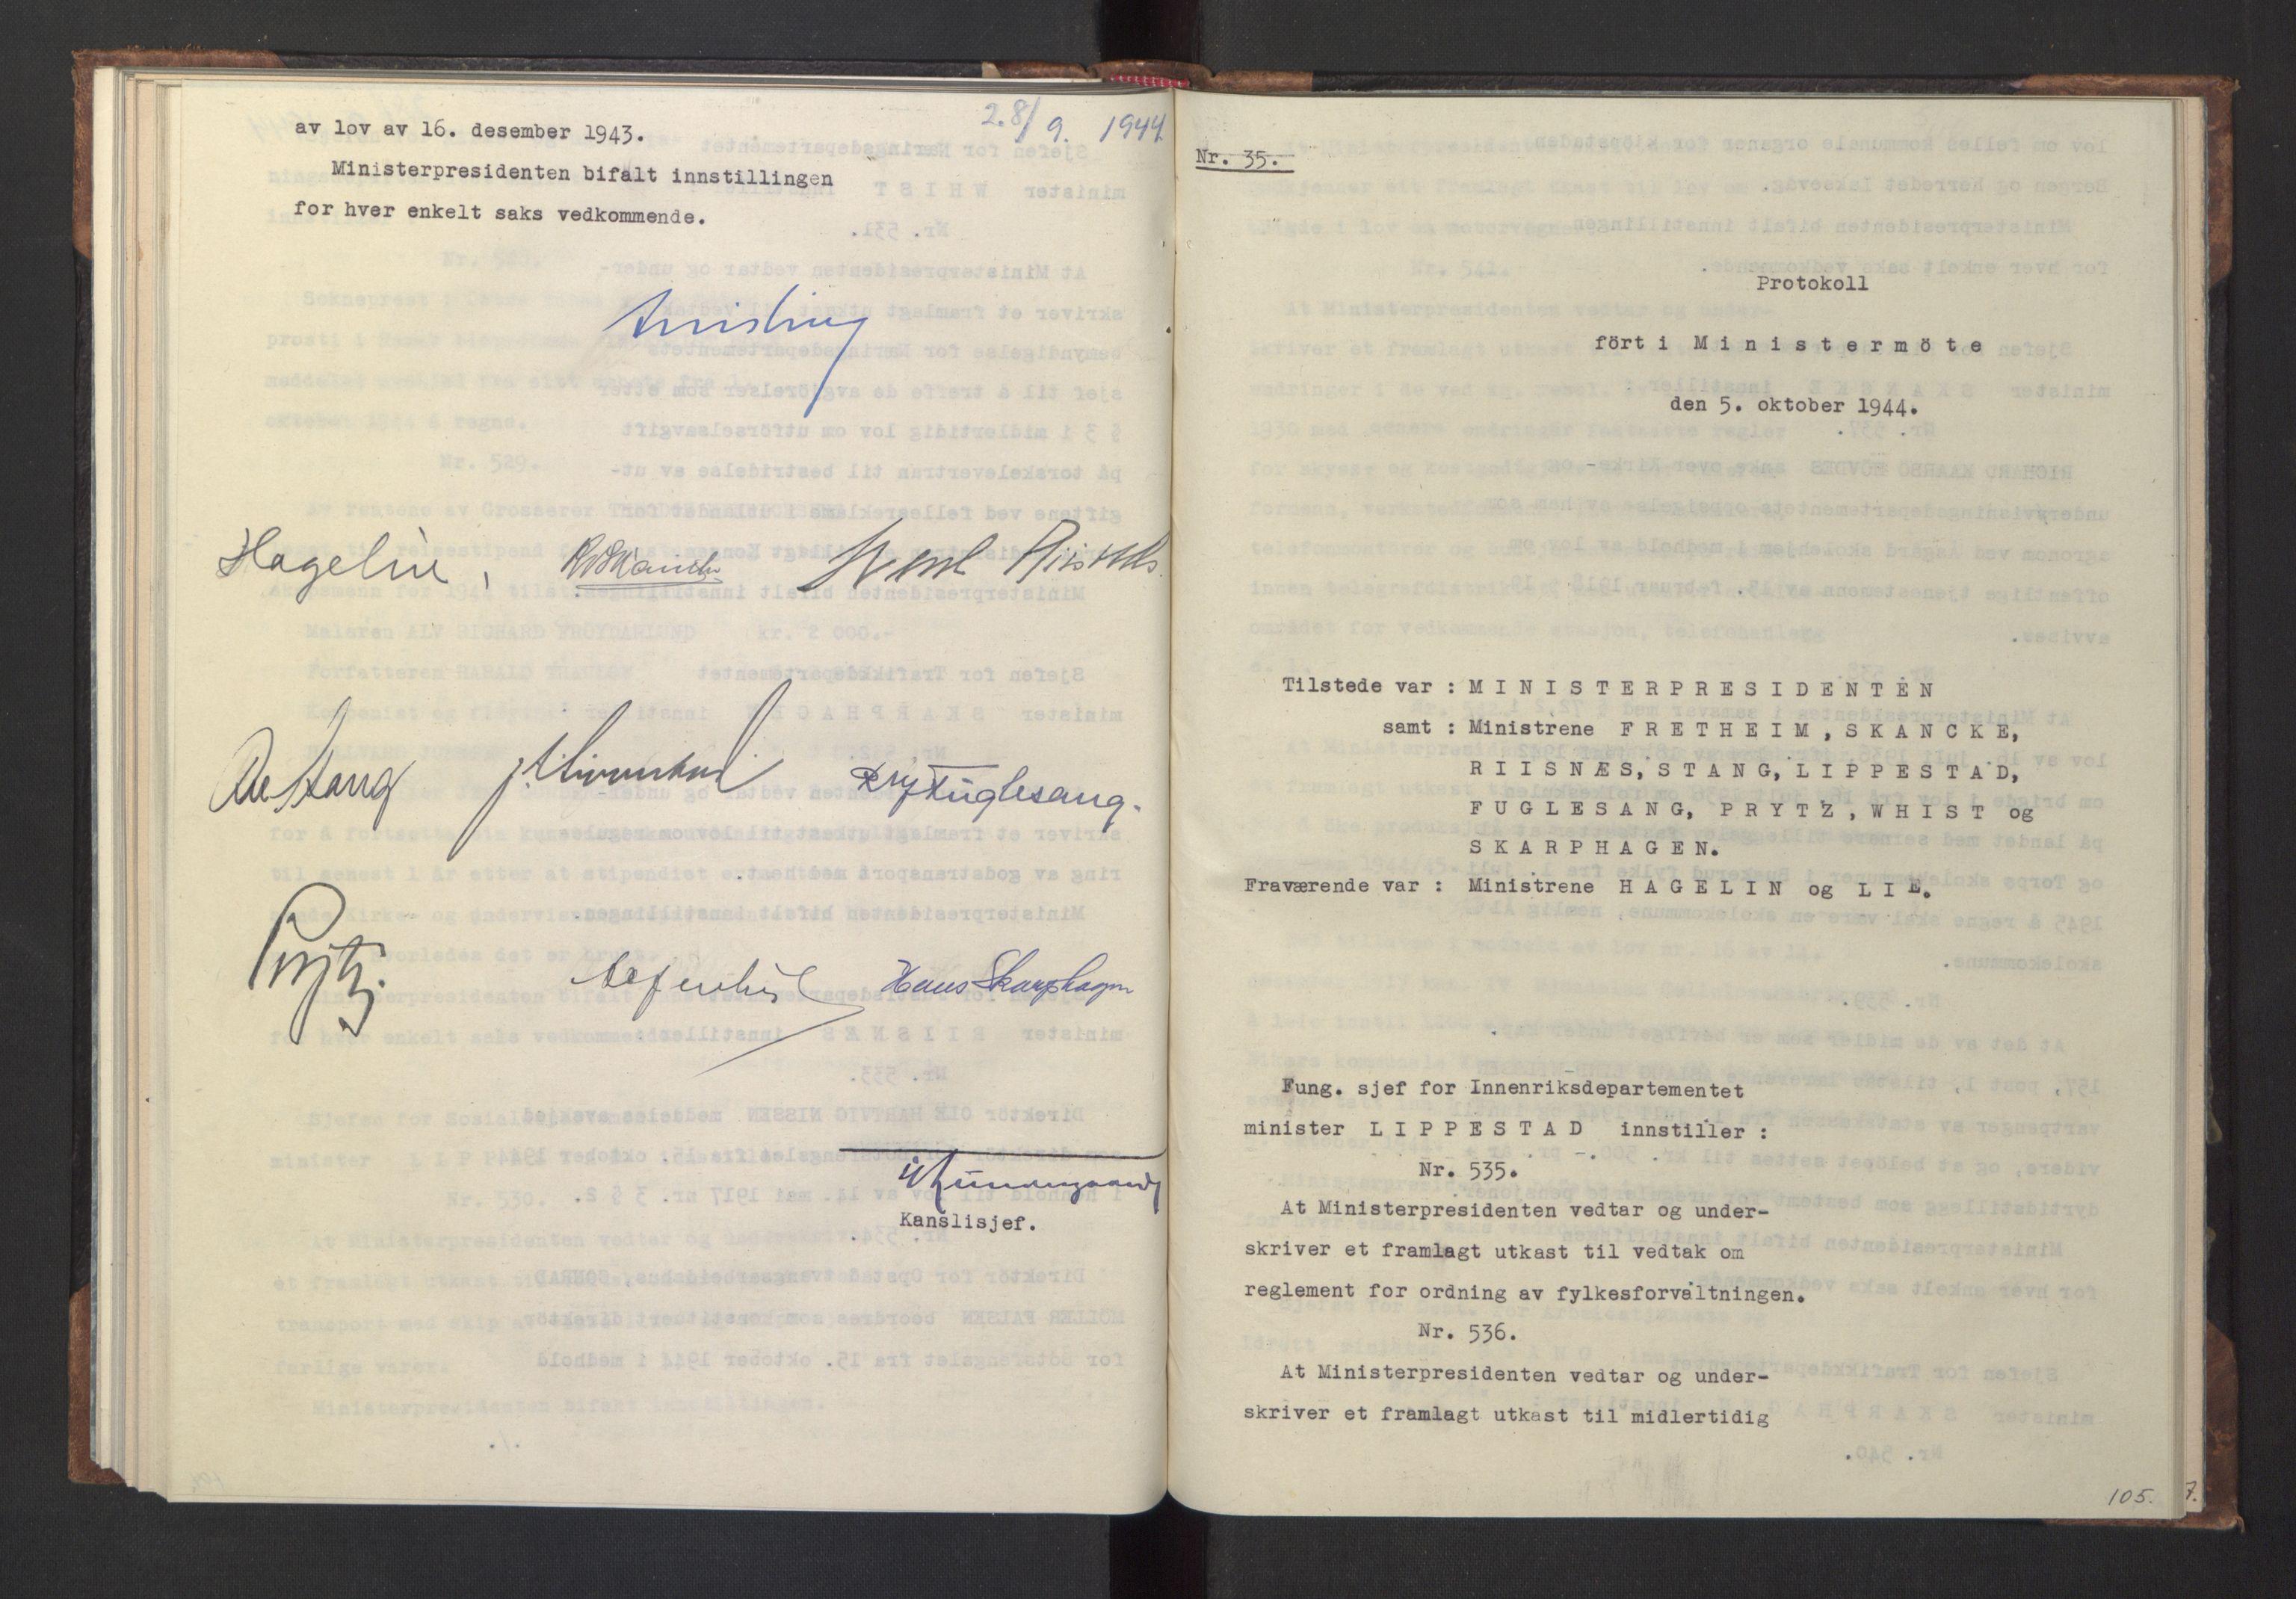 RA, NS-administrasjonen 1940-1945 (Statsrådsekretariatet, de kommisariske statsråder mm), D/Da/L0005: Protokoll fra ministermøter, 1944, s. 104b-105a